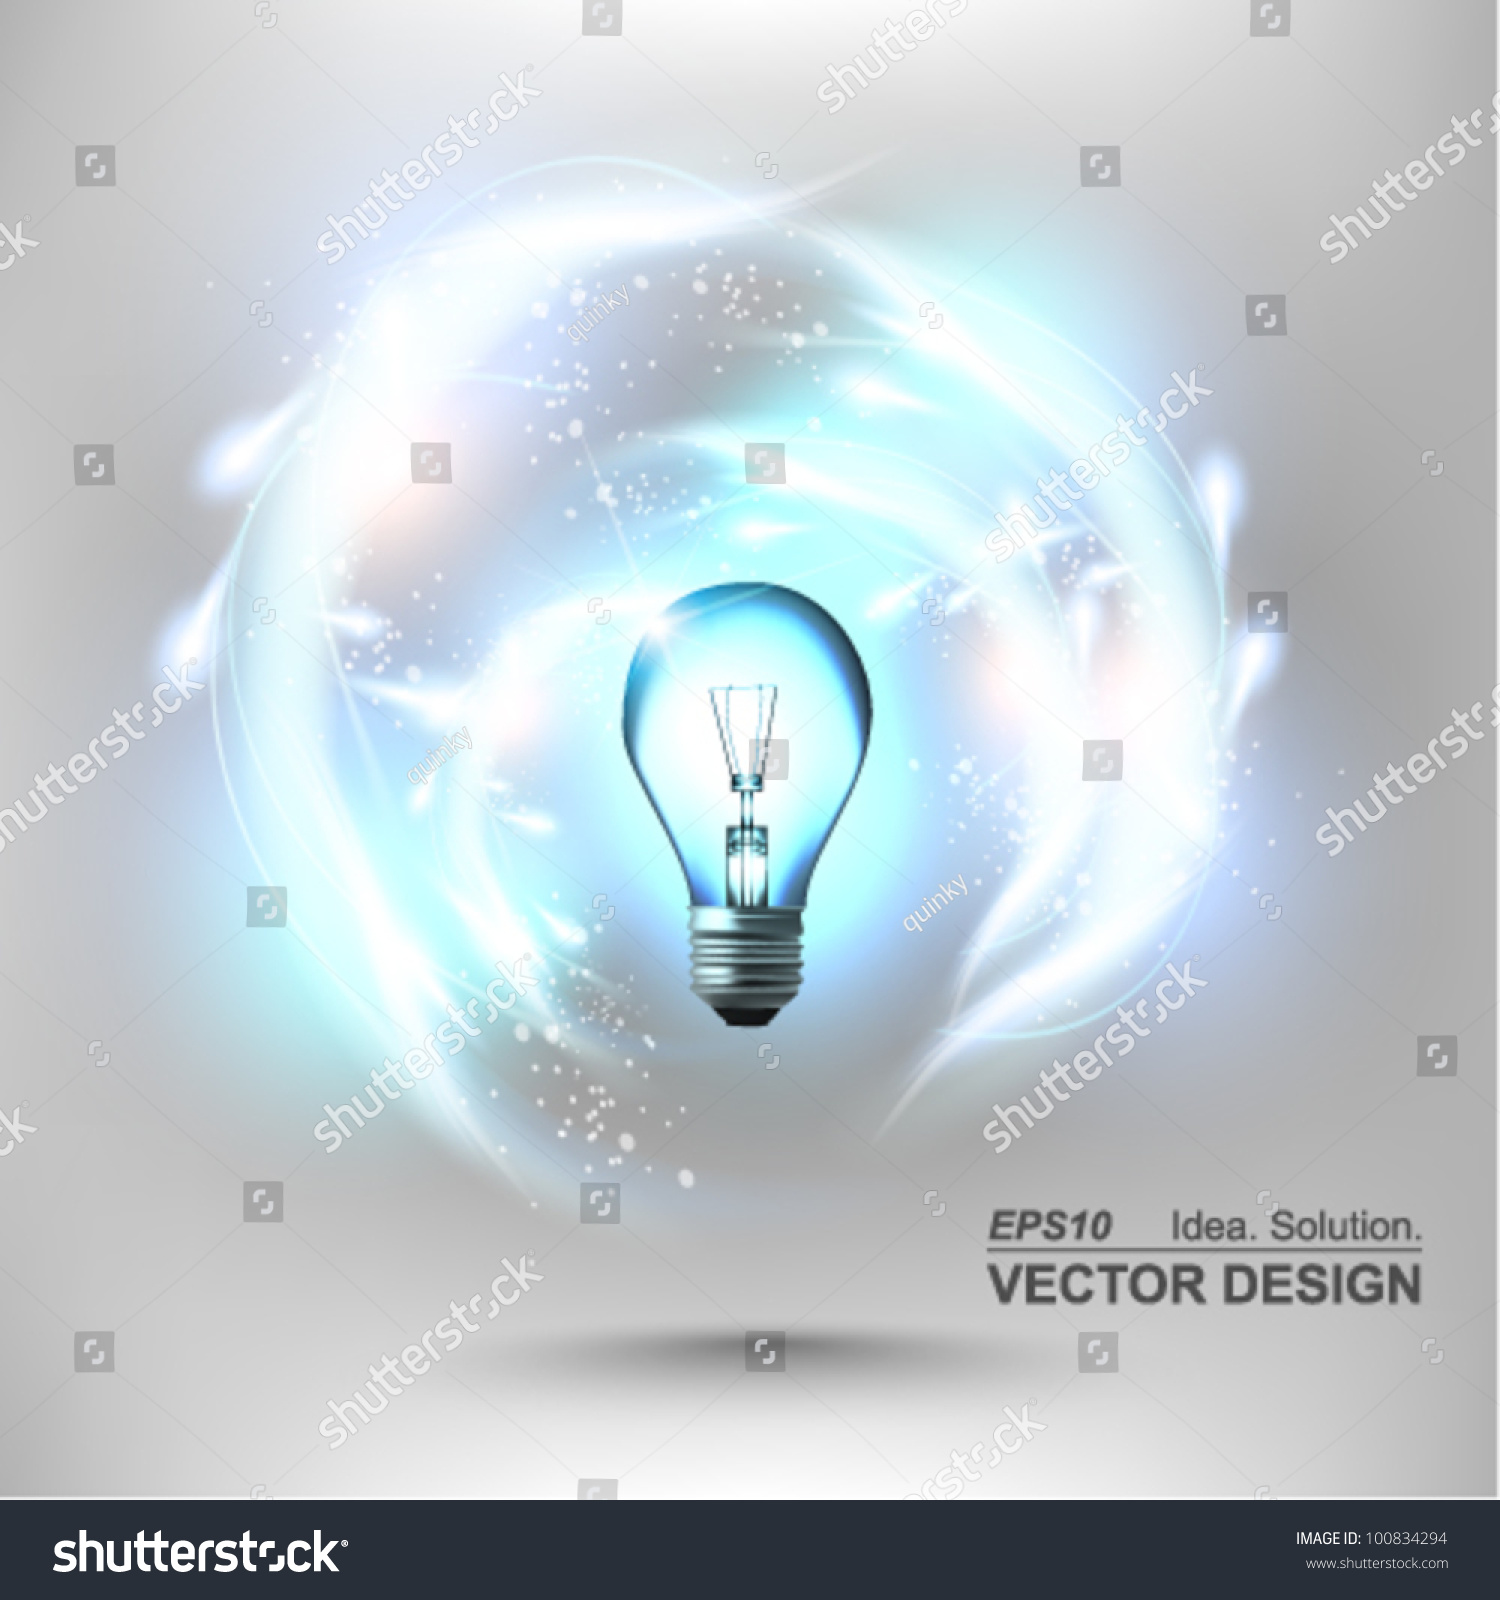 Idea Design design creative idea and color concept Stylish Conceptual Digital Light Bulb Idea Design Stock Vector Illustration 100834294 Shutterstock